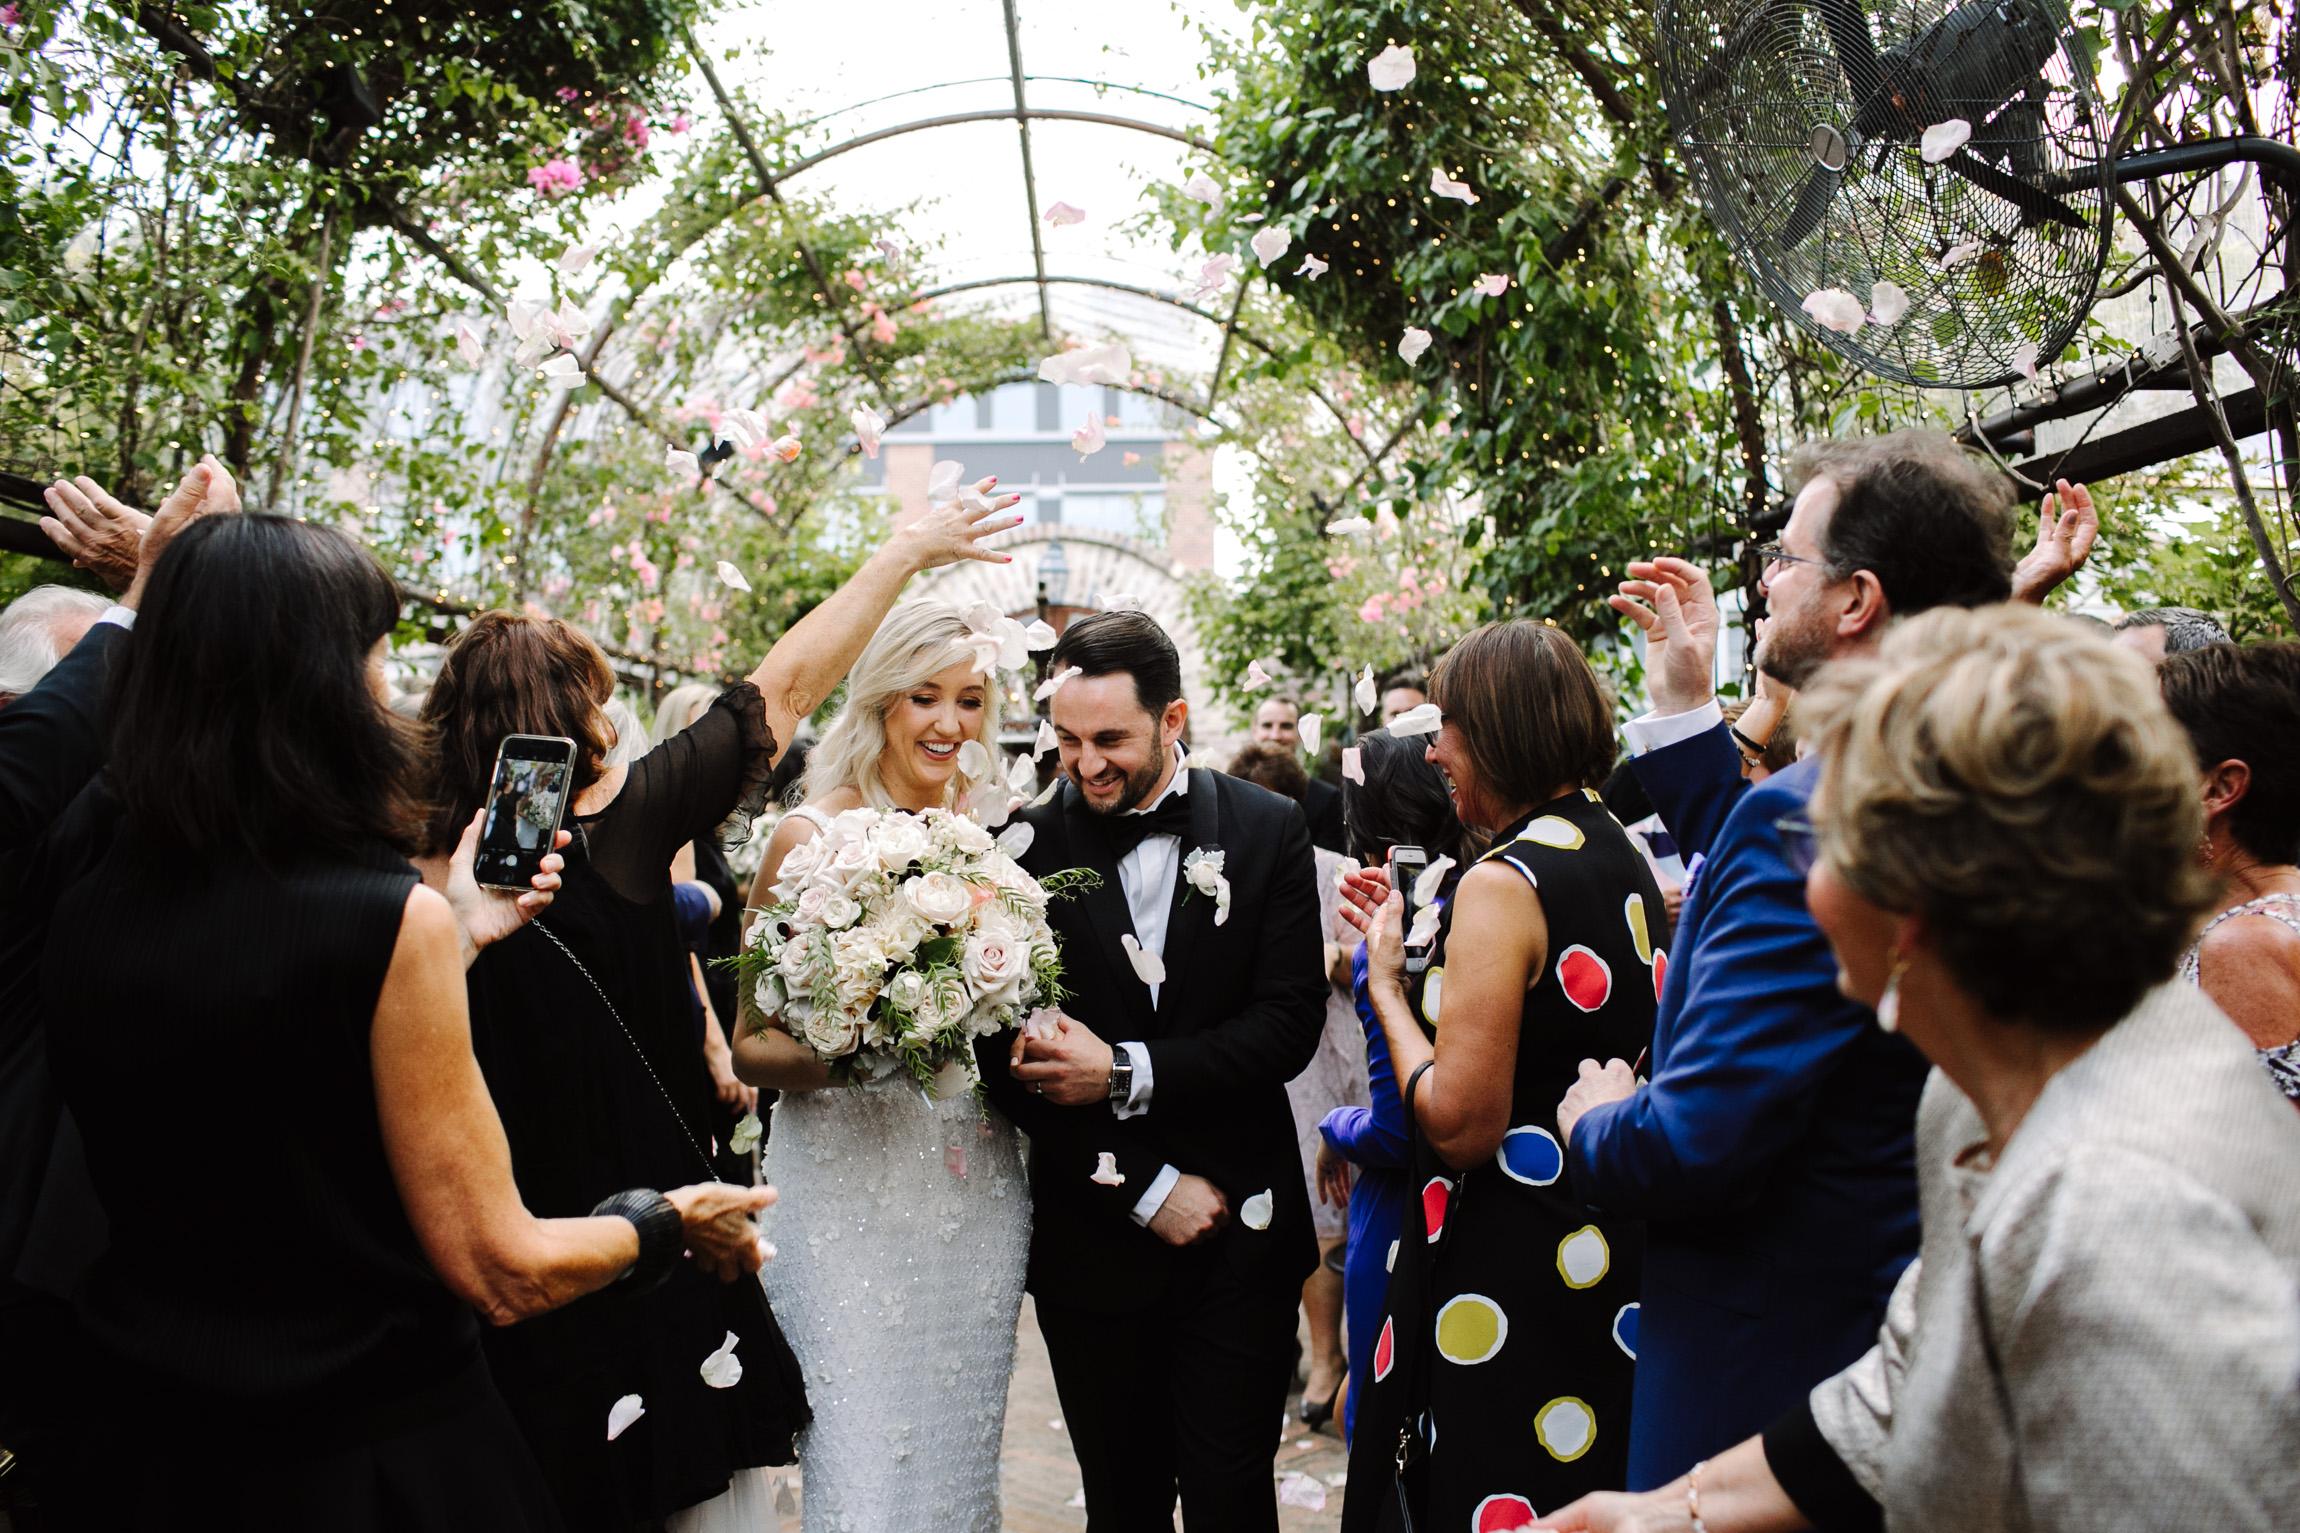 180223_justinaaron_wedding_charlotte_david_h-138.jpg